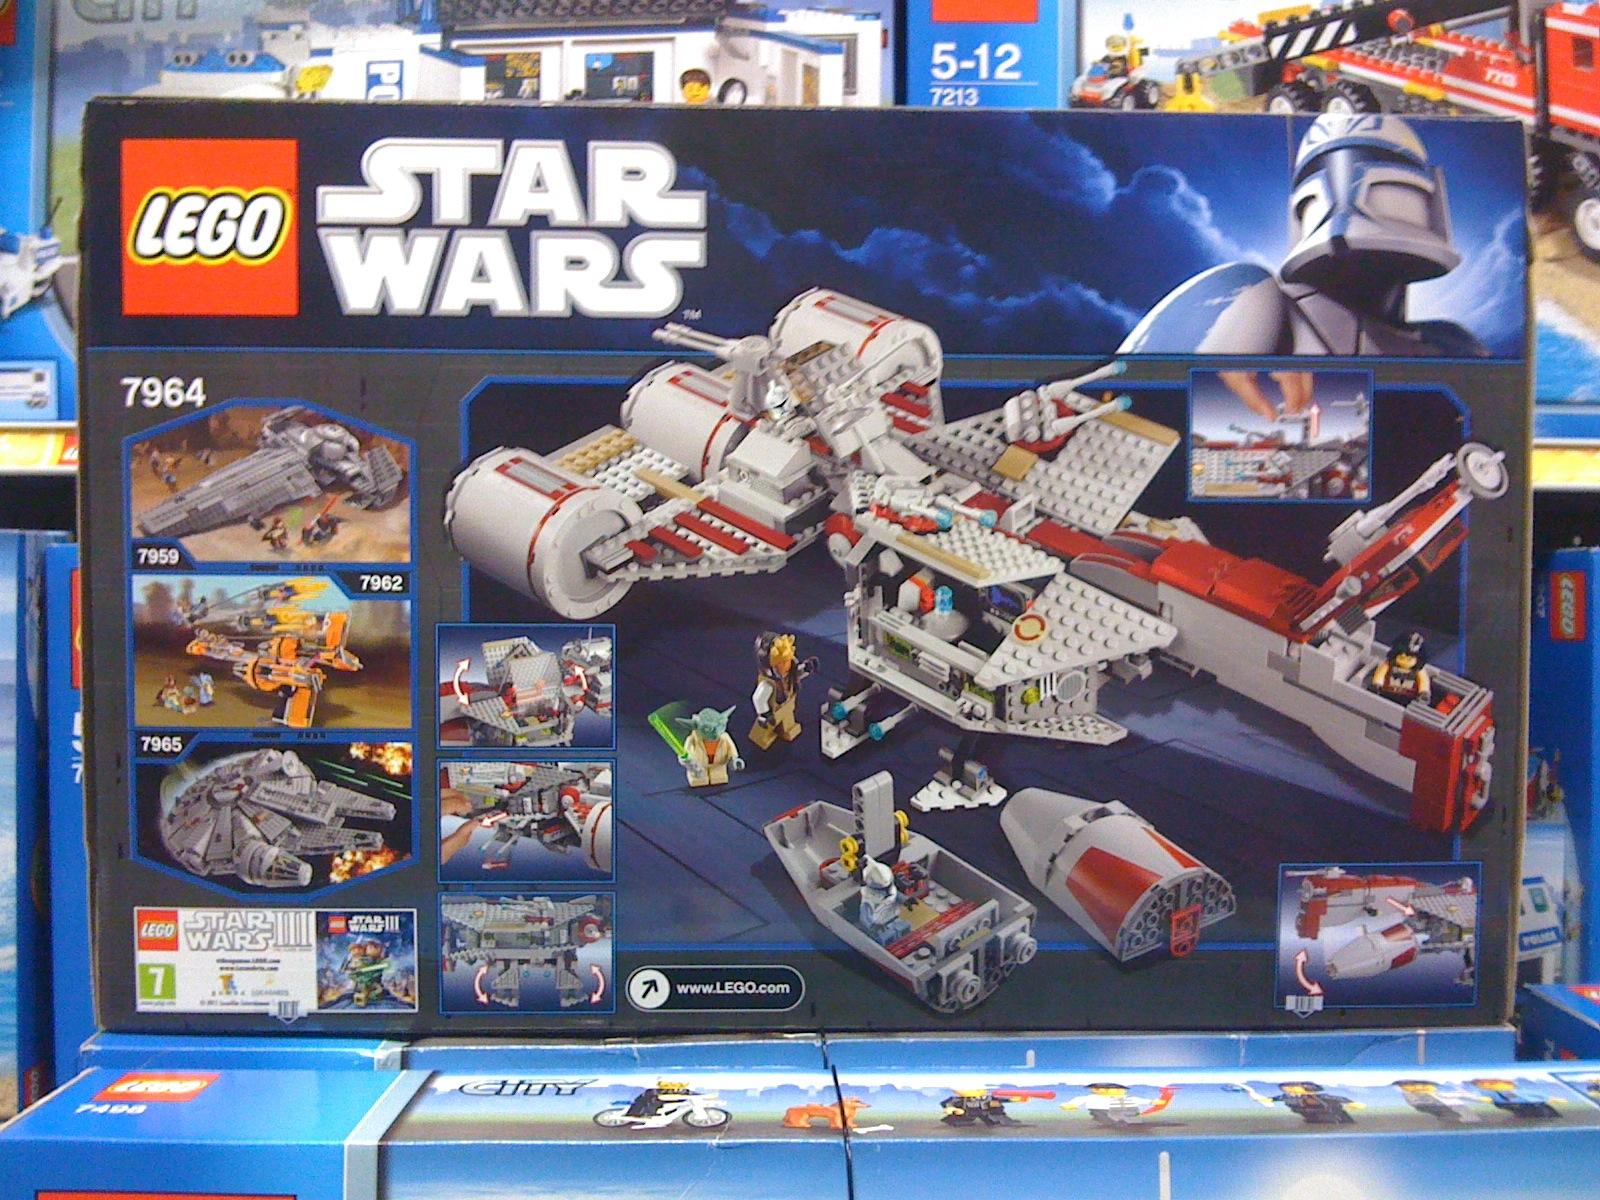 LEGO 7964 Star Wars Clone Wars Republic Frigate Box Back